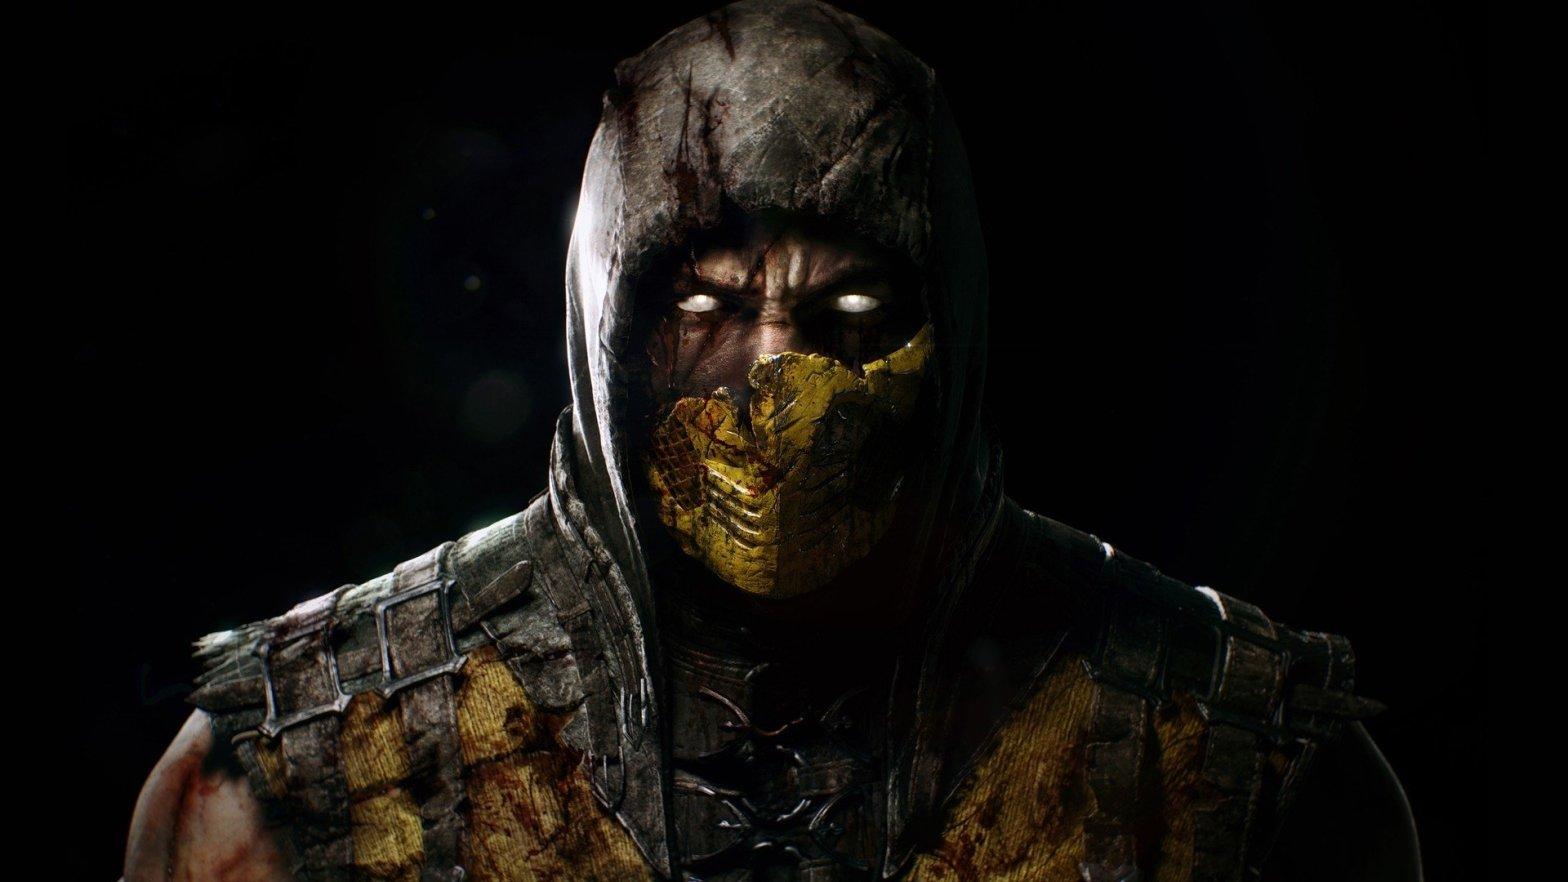 Mortal Kombat X has sold almost 11 million copies